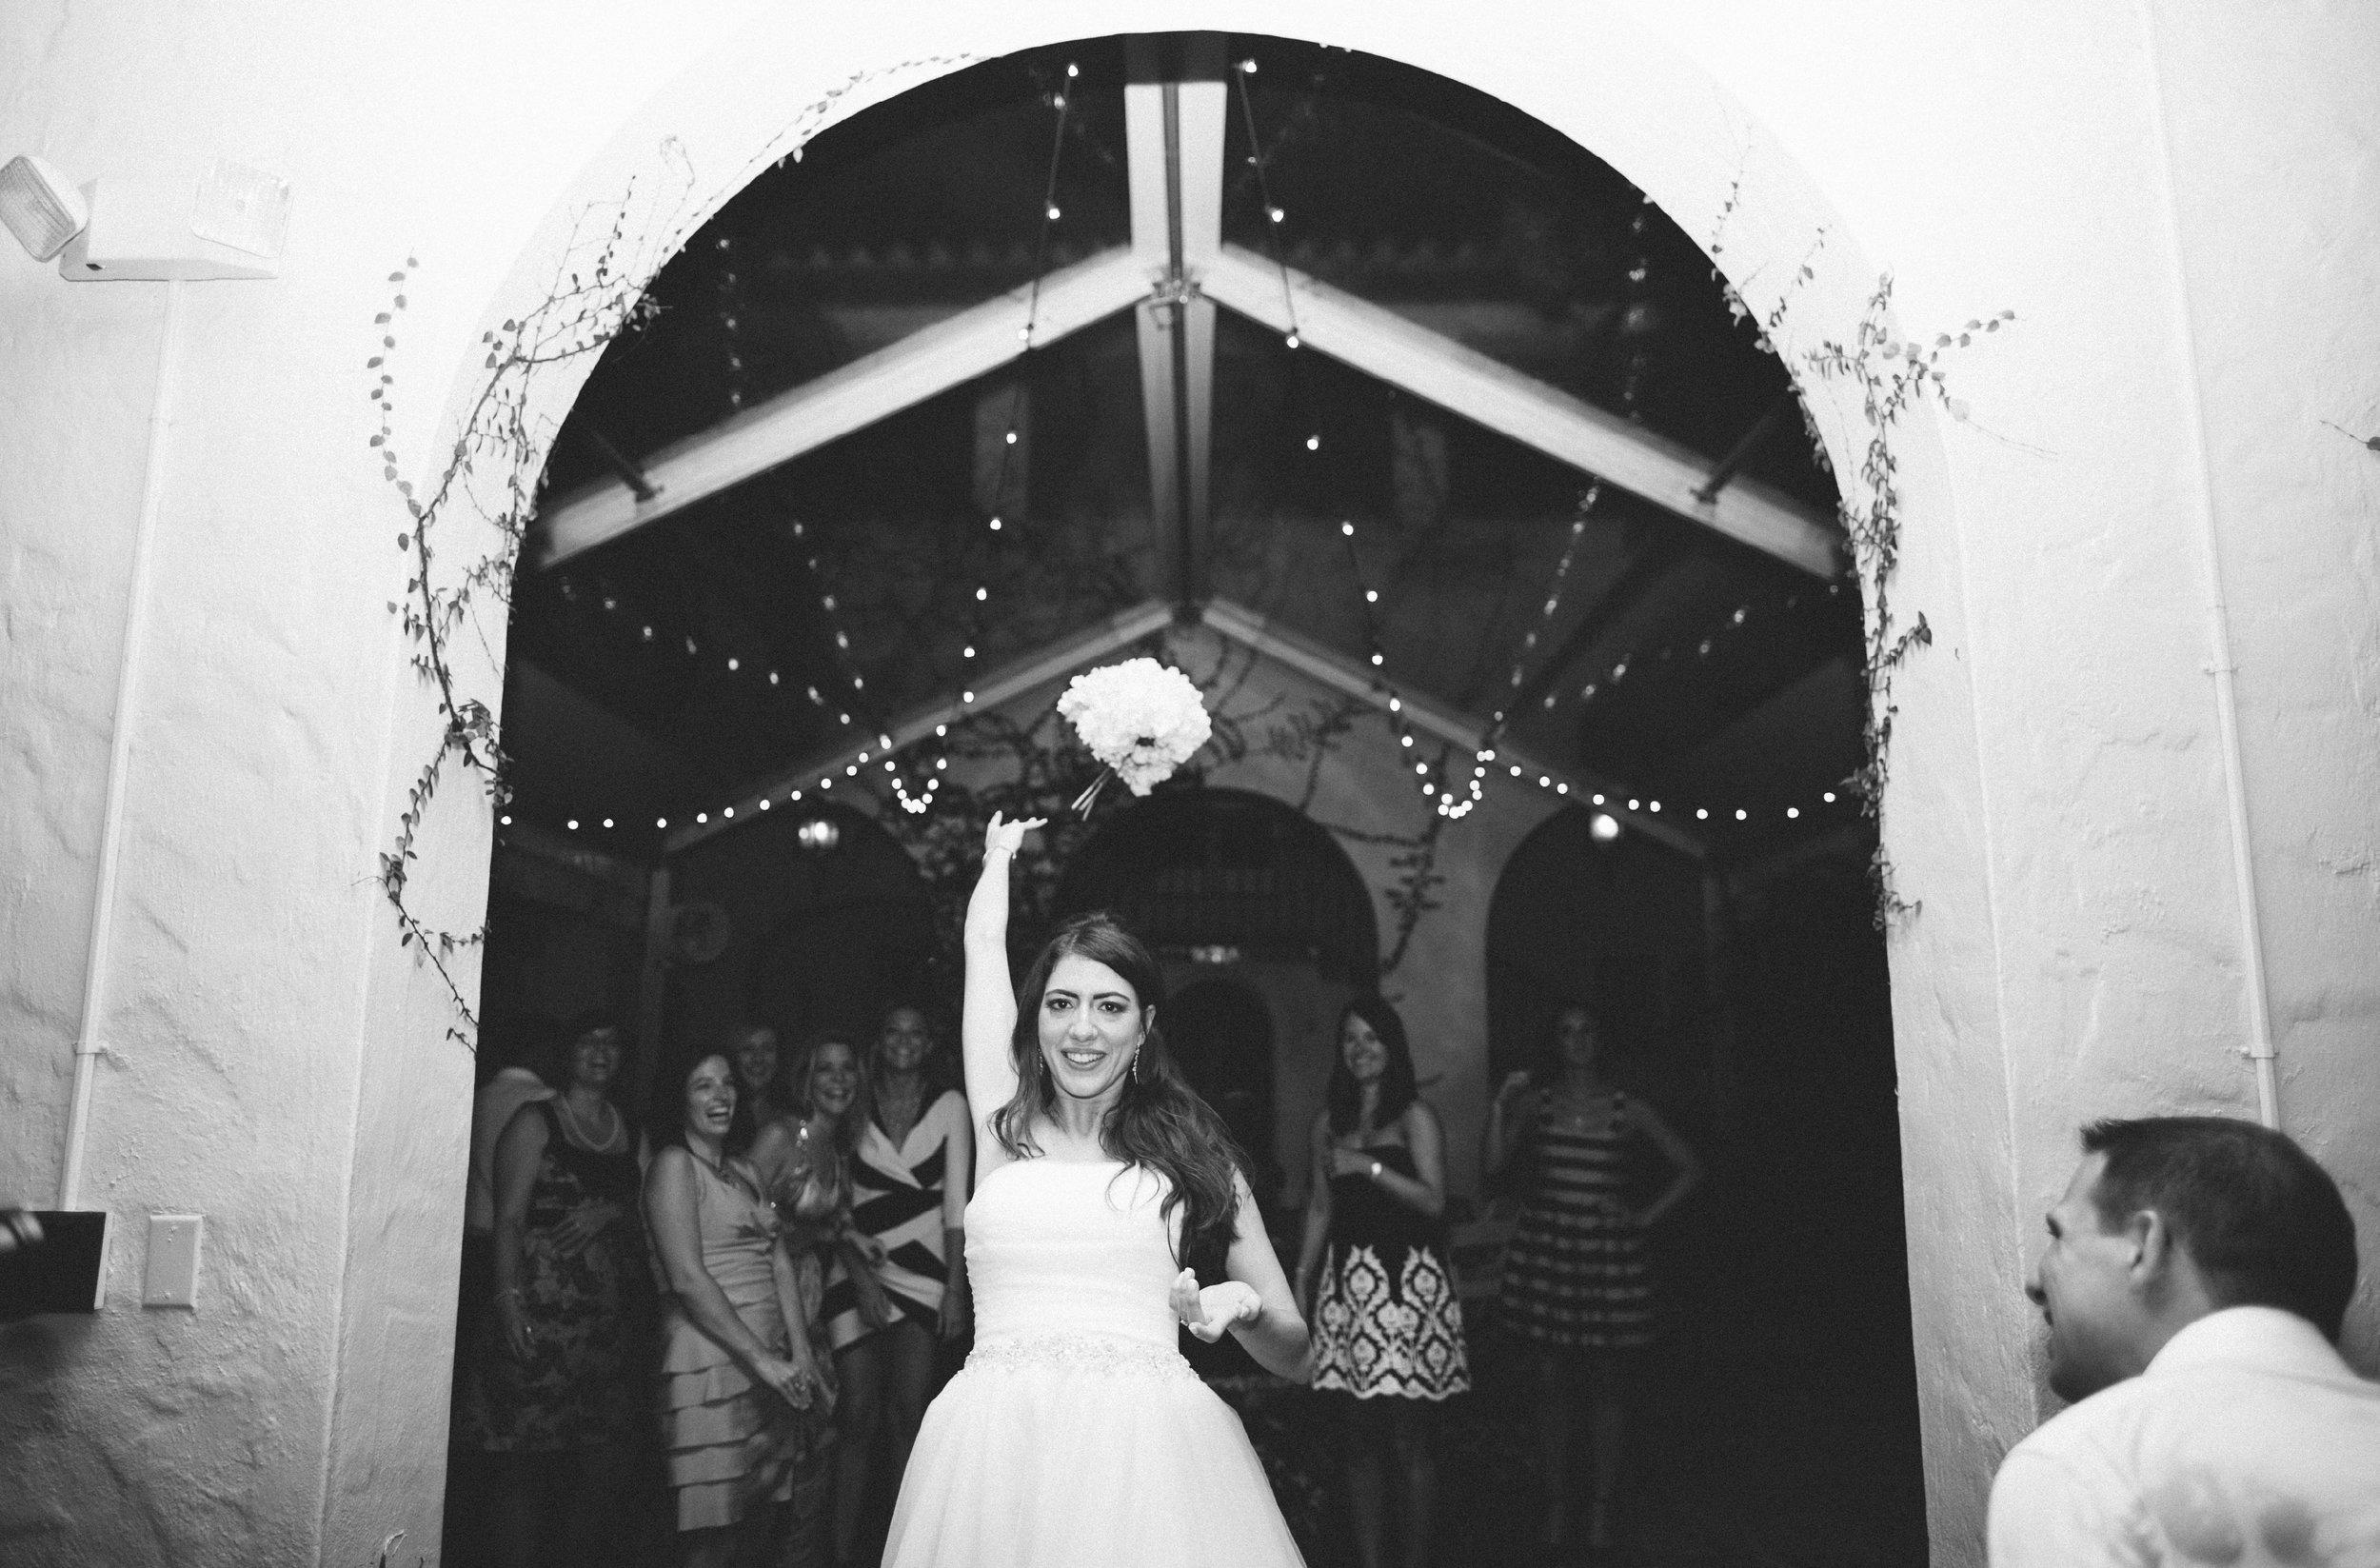 Meli + Mike Coconut Grove Wedding at Villa Woodbine81.jpg